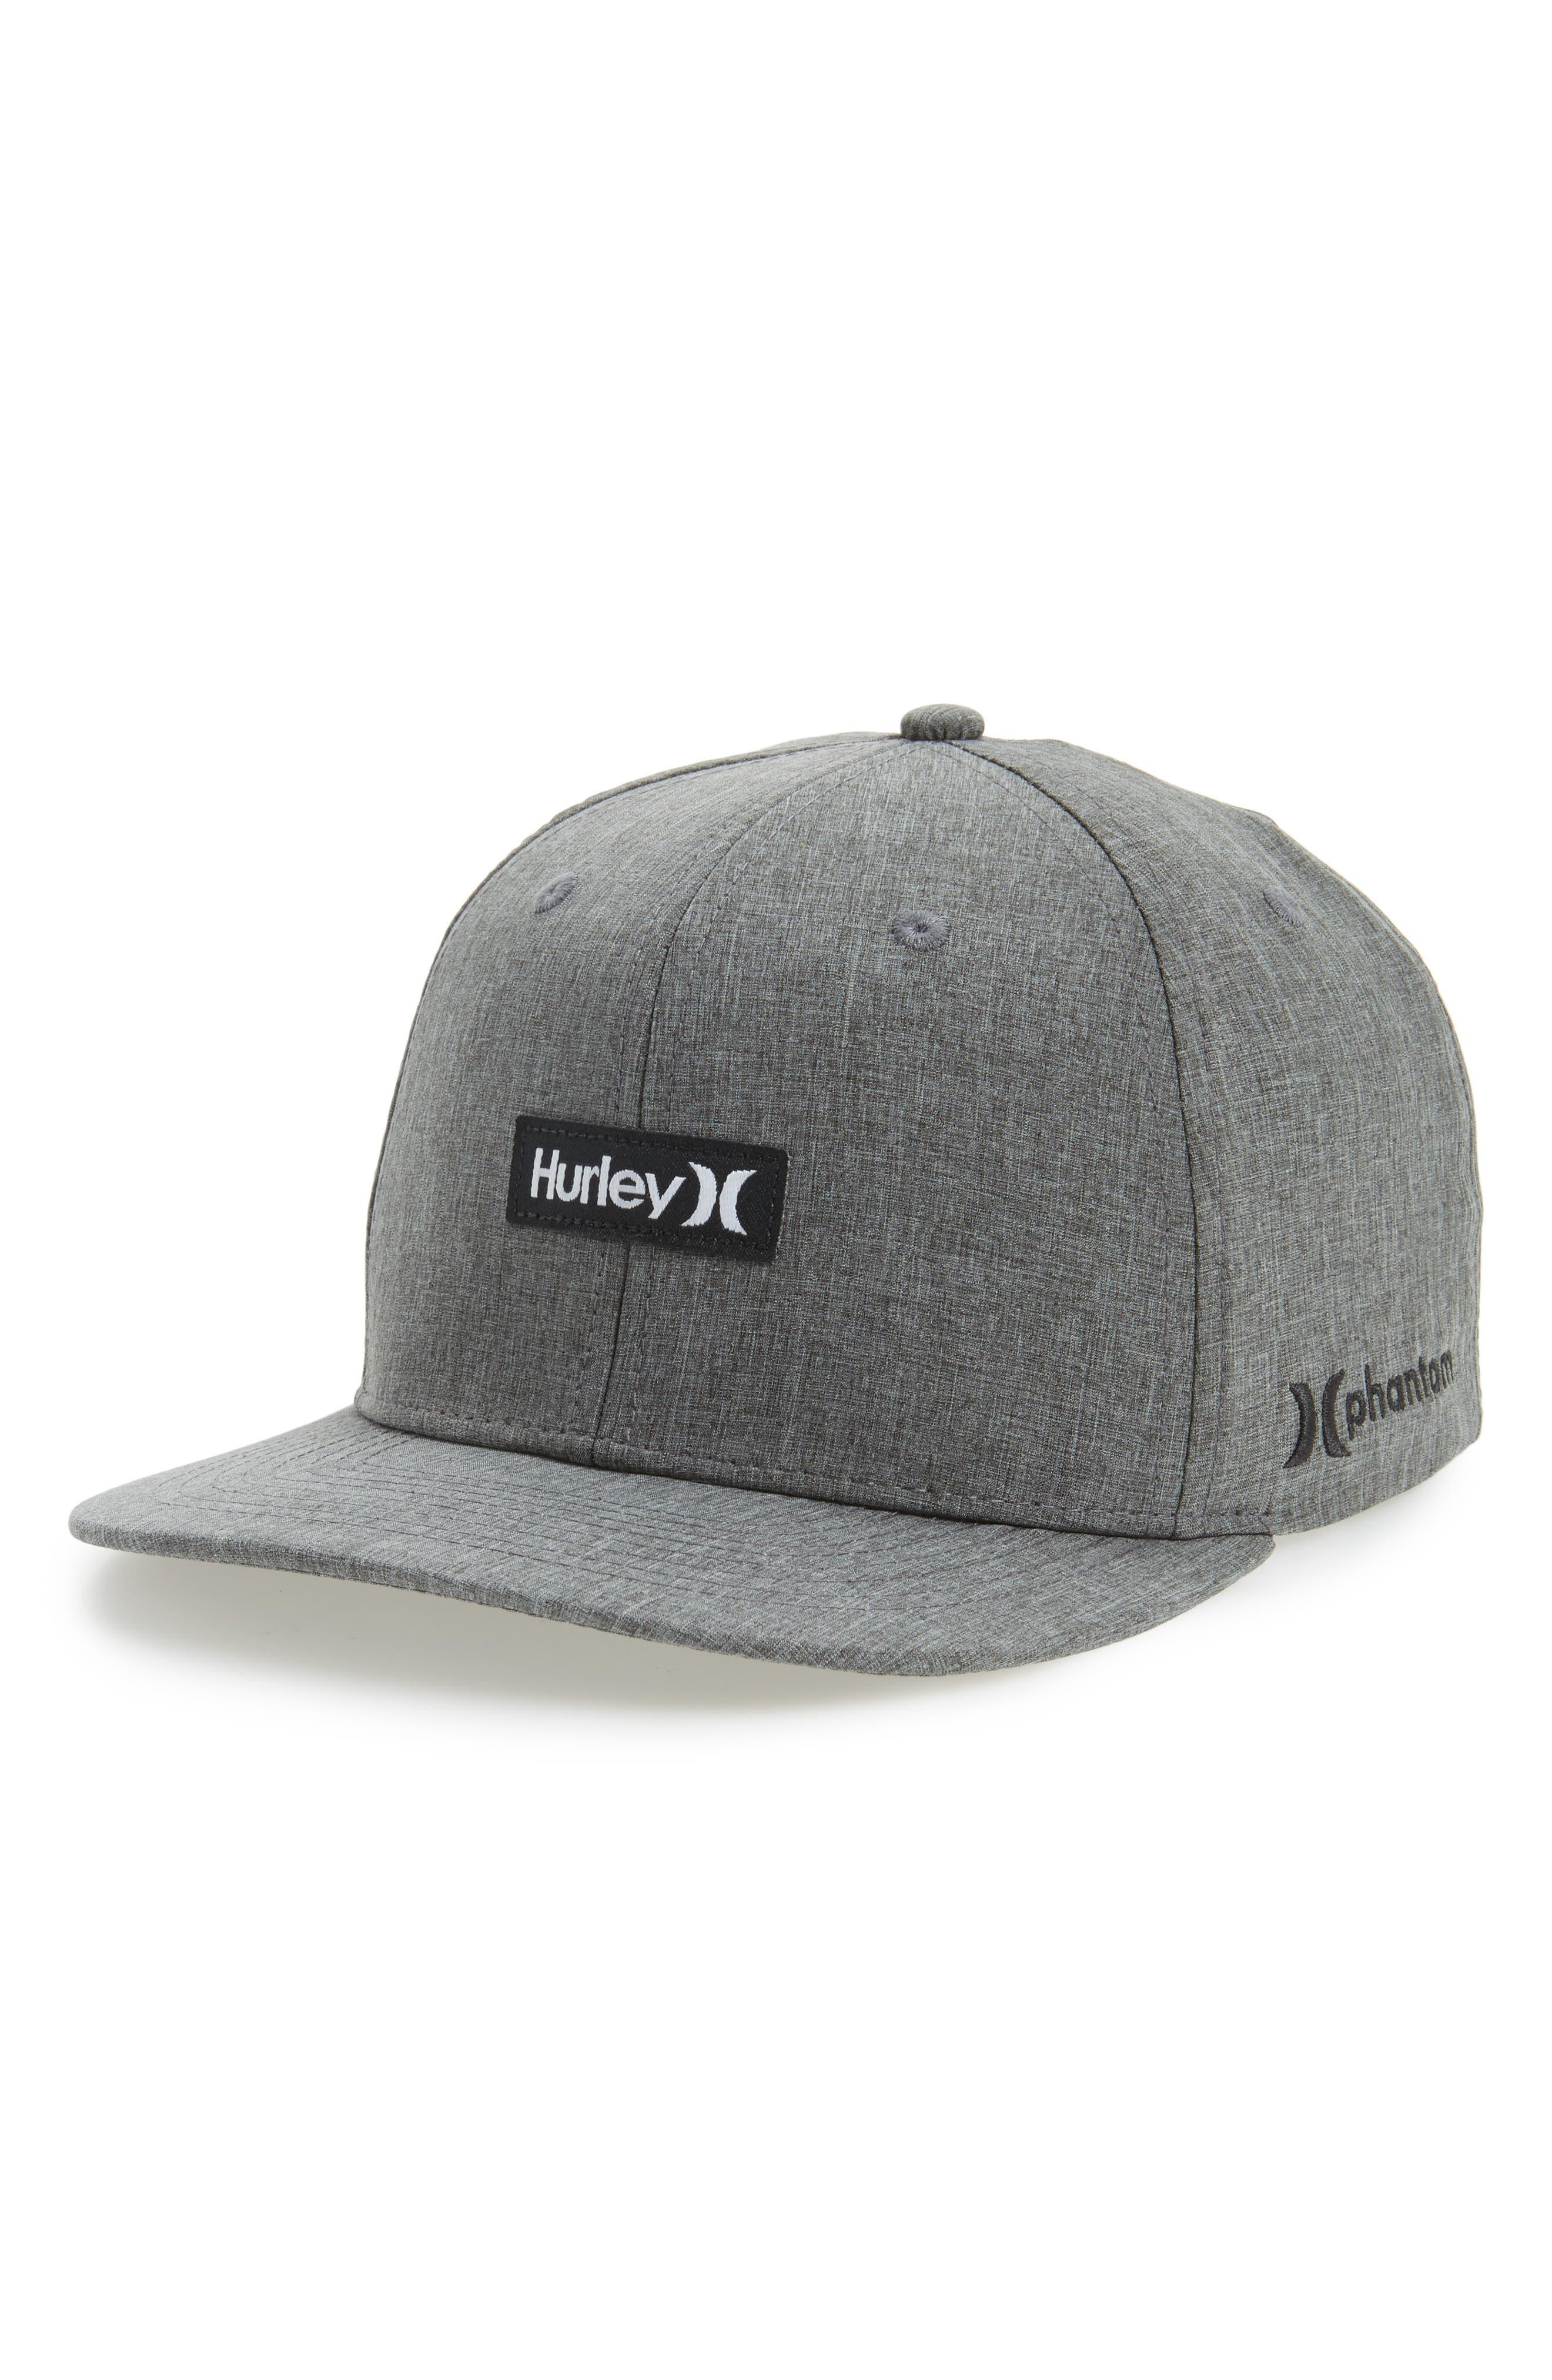 Main Image - Hurley Phantom One & Only Snapback Baseball Cap